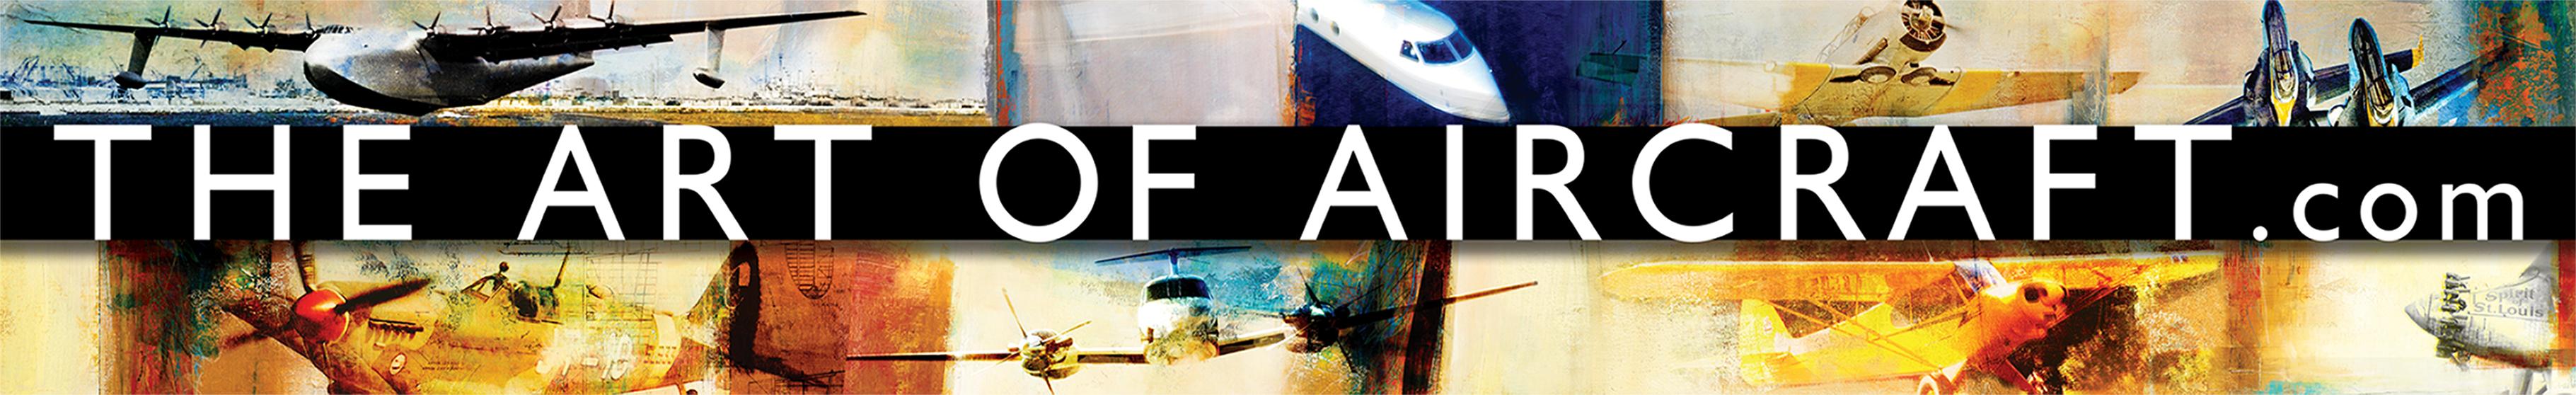 client-logos-The Art of Aircraft logo